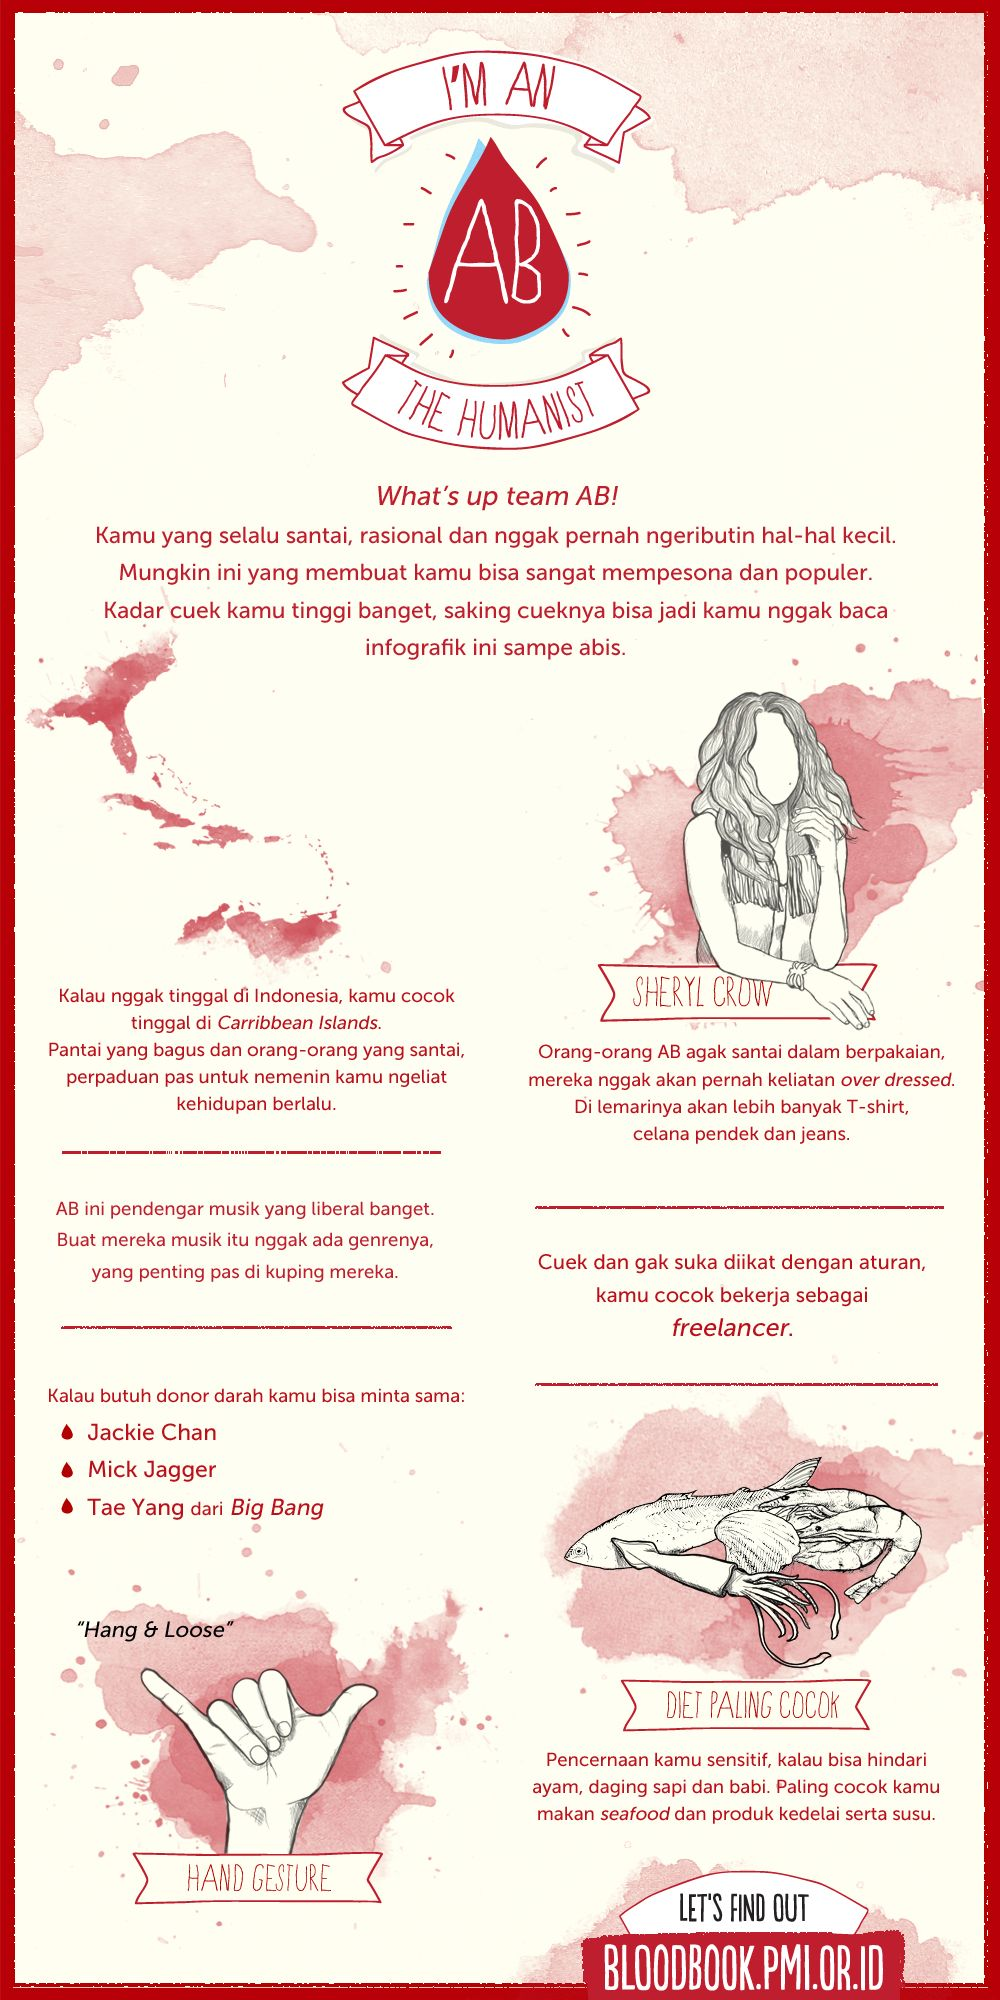 Perbedaan Lah Kok Sih Dong Bahasa Gaul Indonesia Some